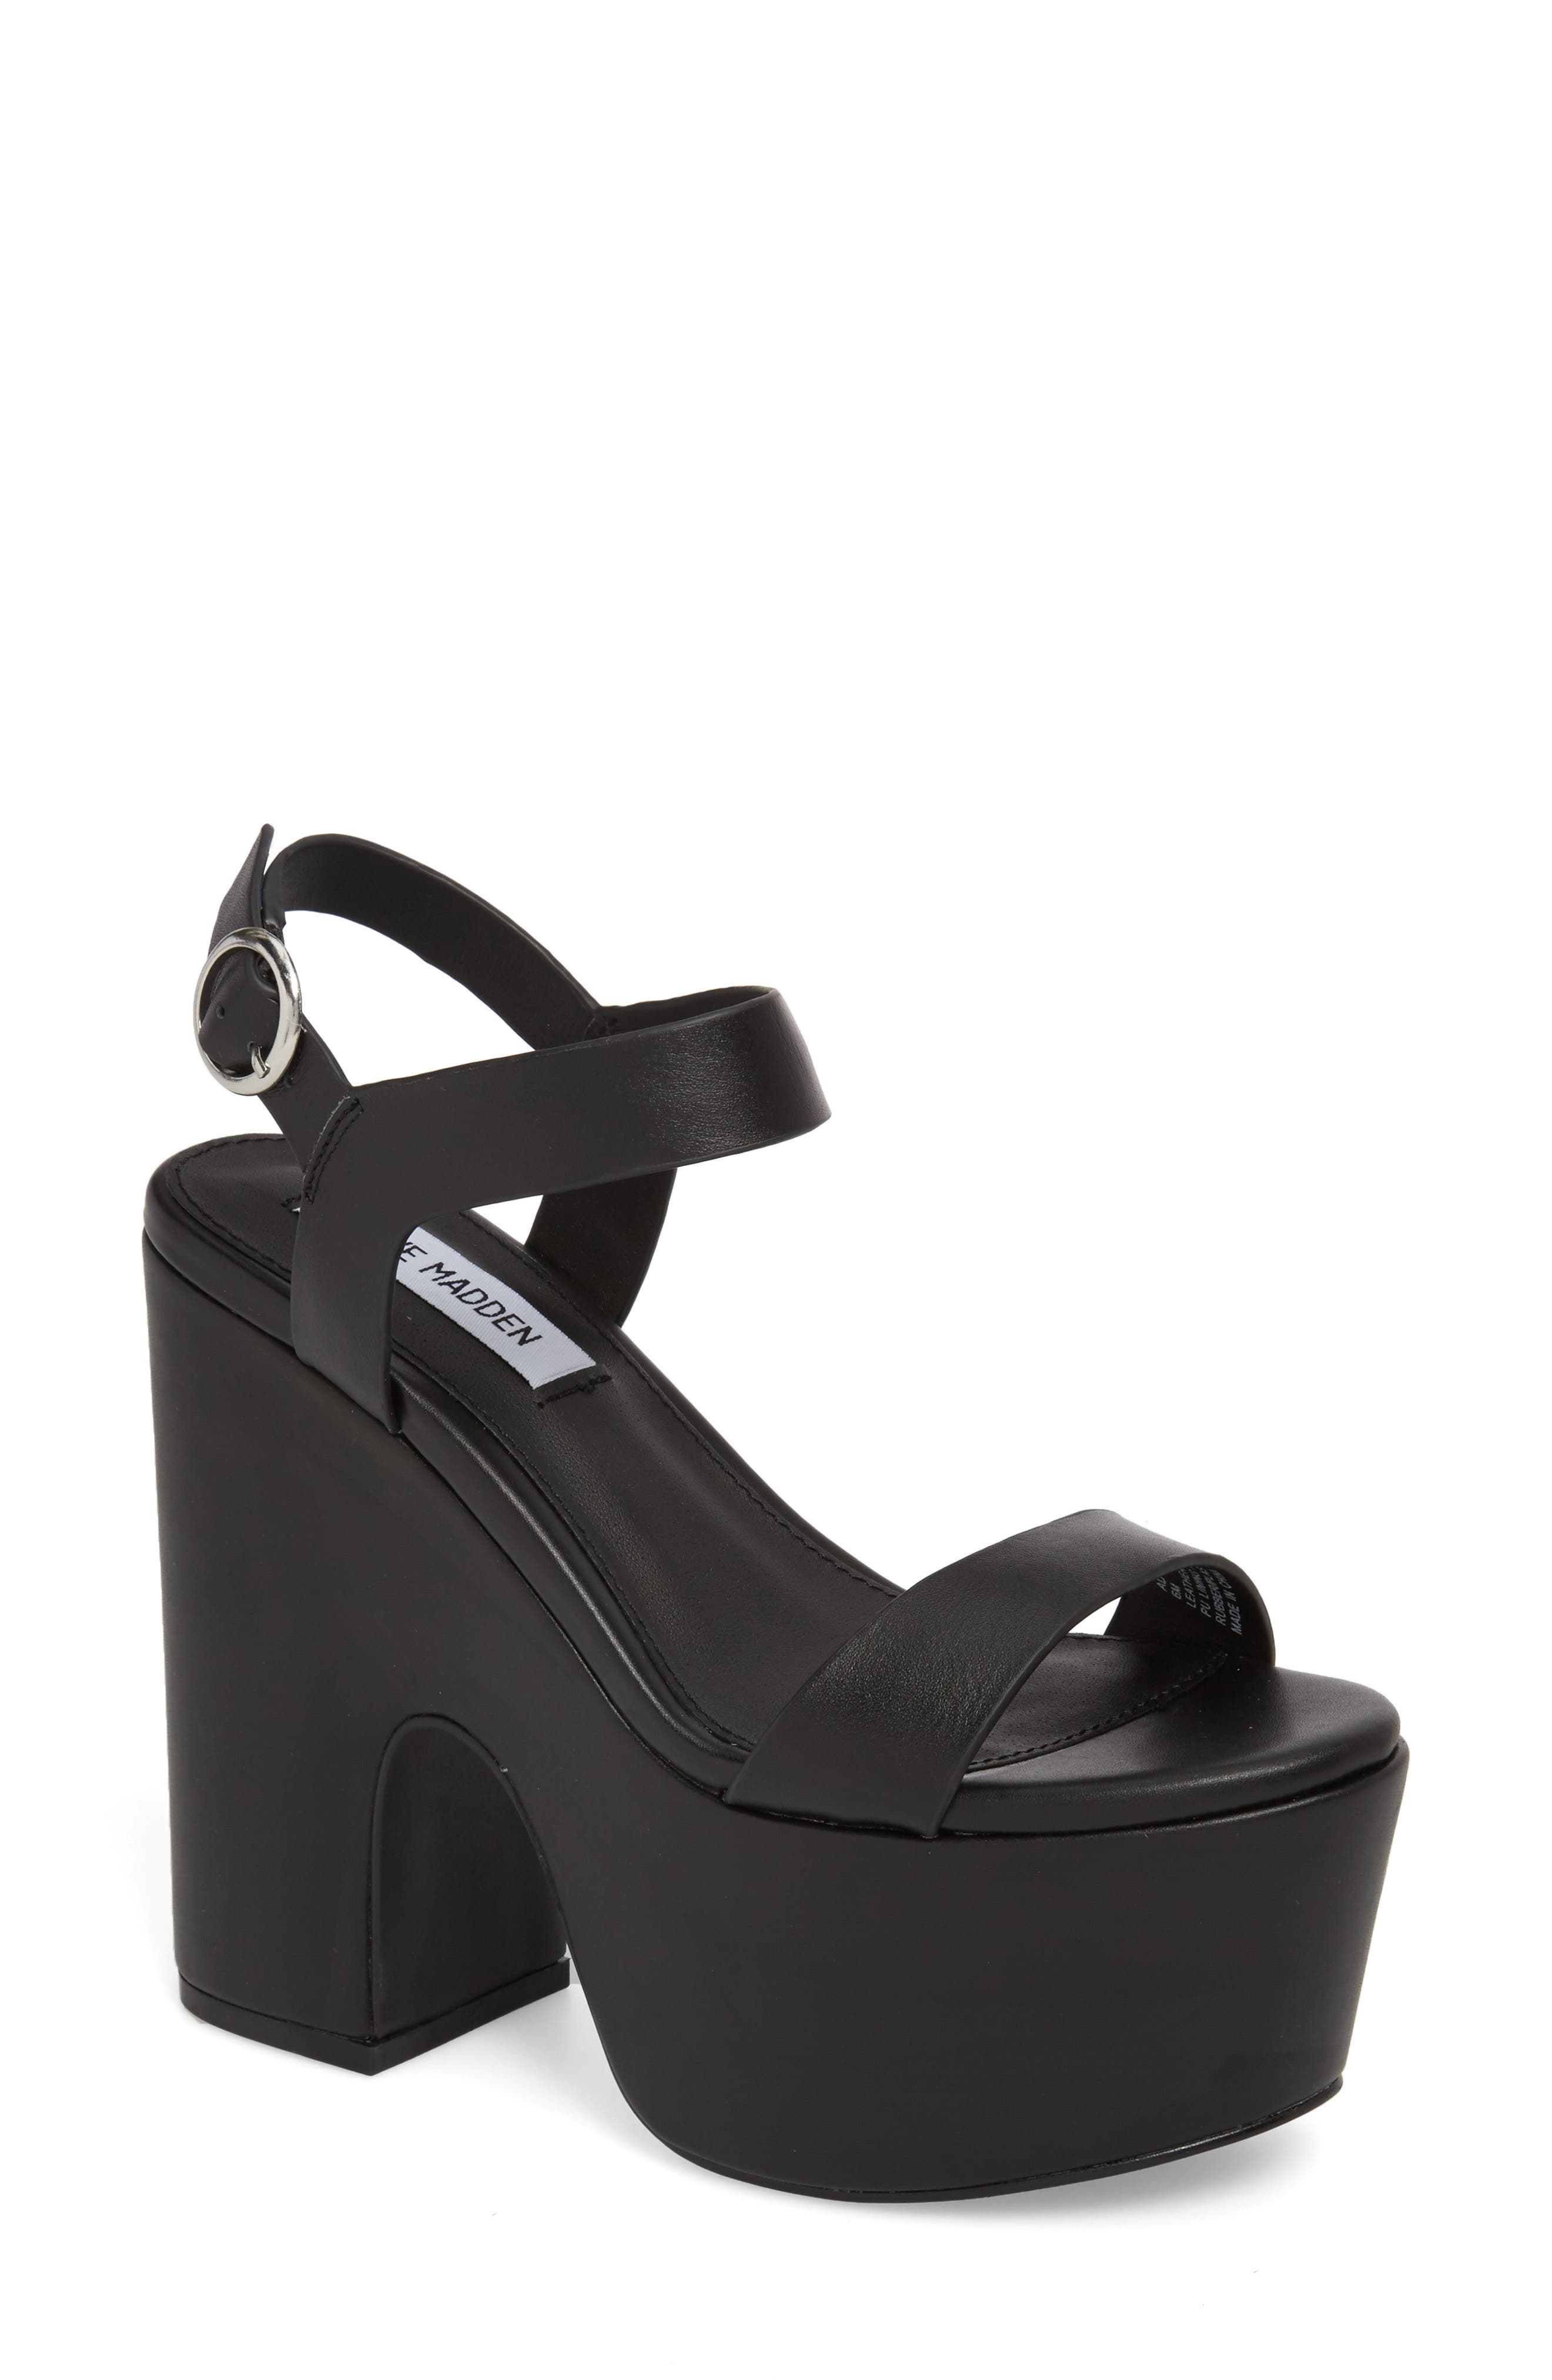 Advice Platform Sandal,                             Main thumbnail 1, color,                             Black Leather